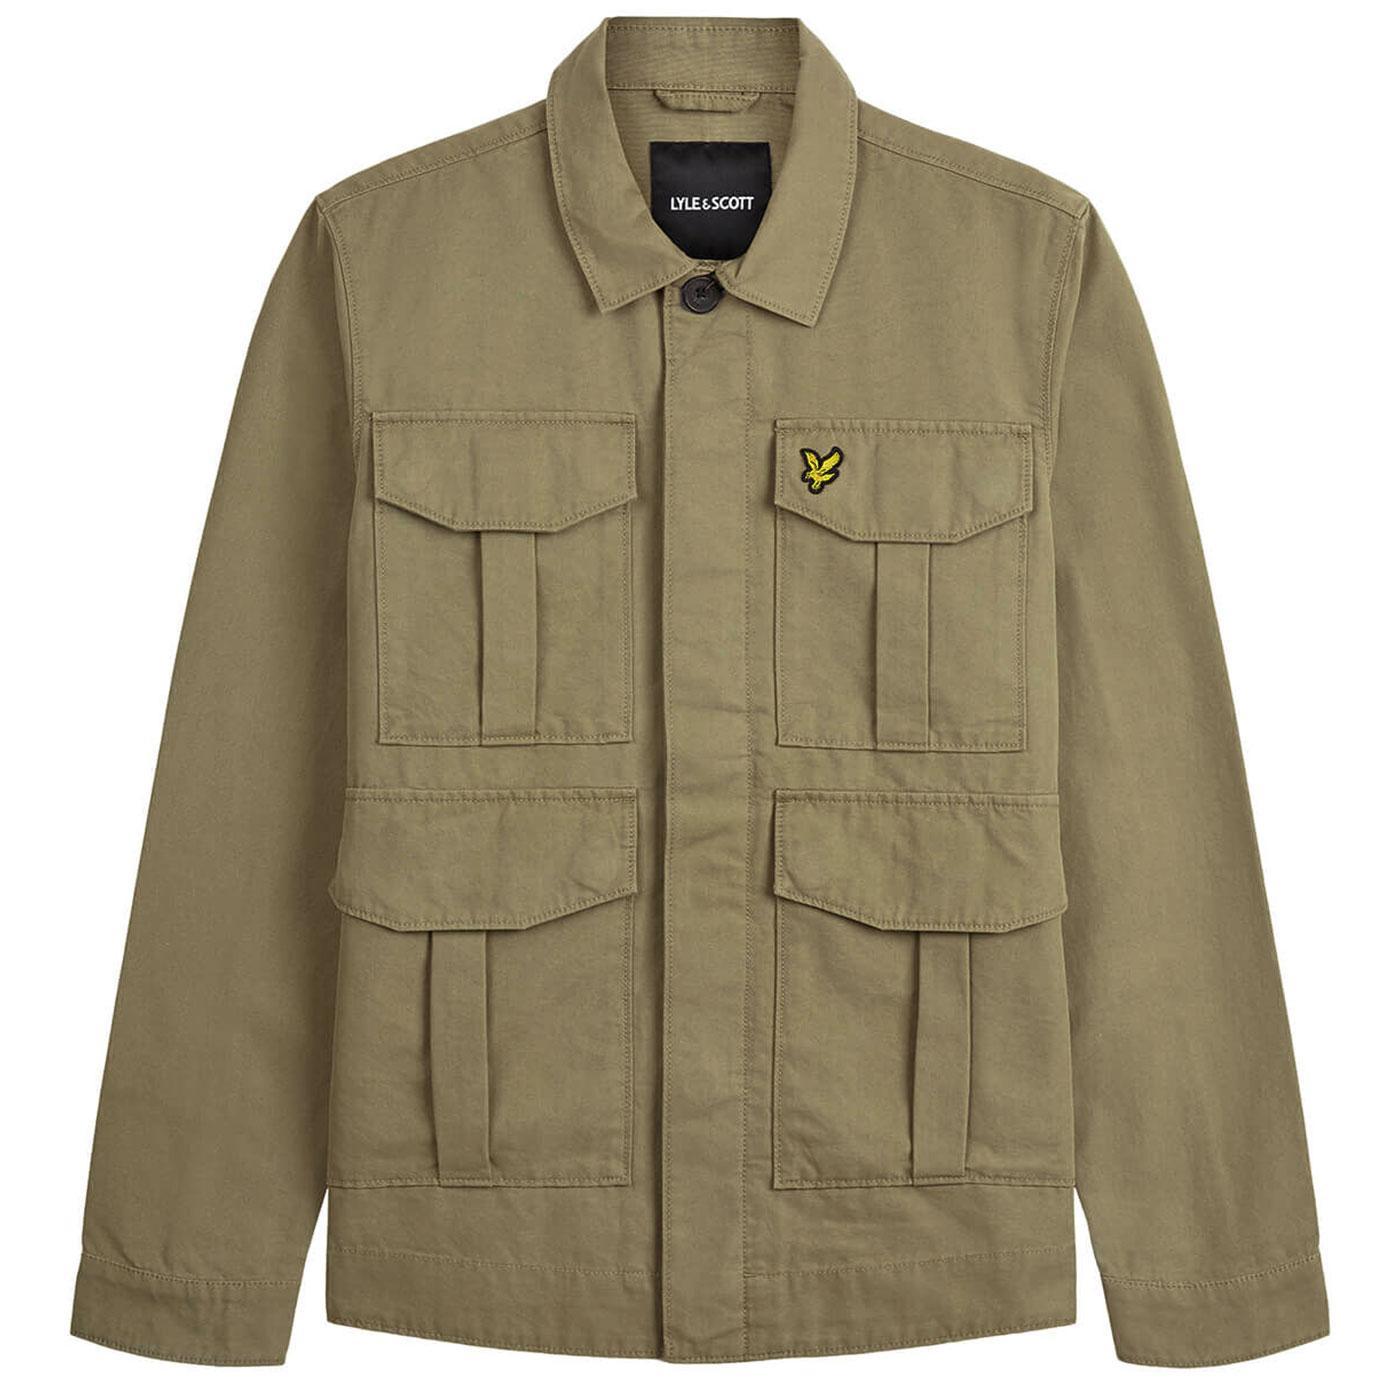 LYLE & SCOTT Mens Retro Military Utility Jacket LG